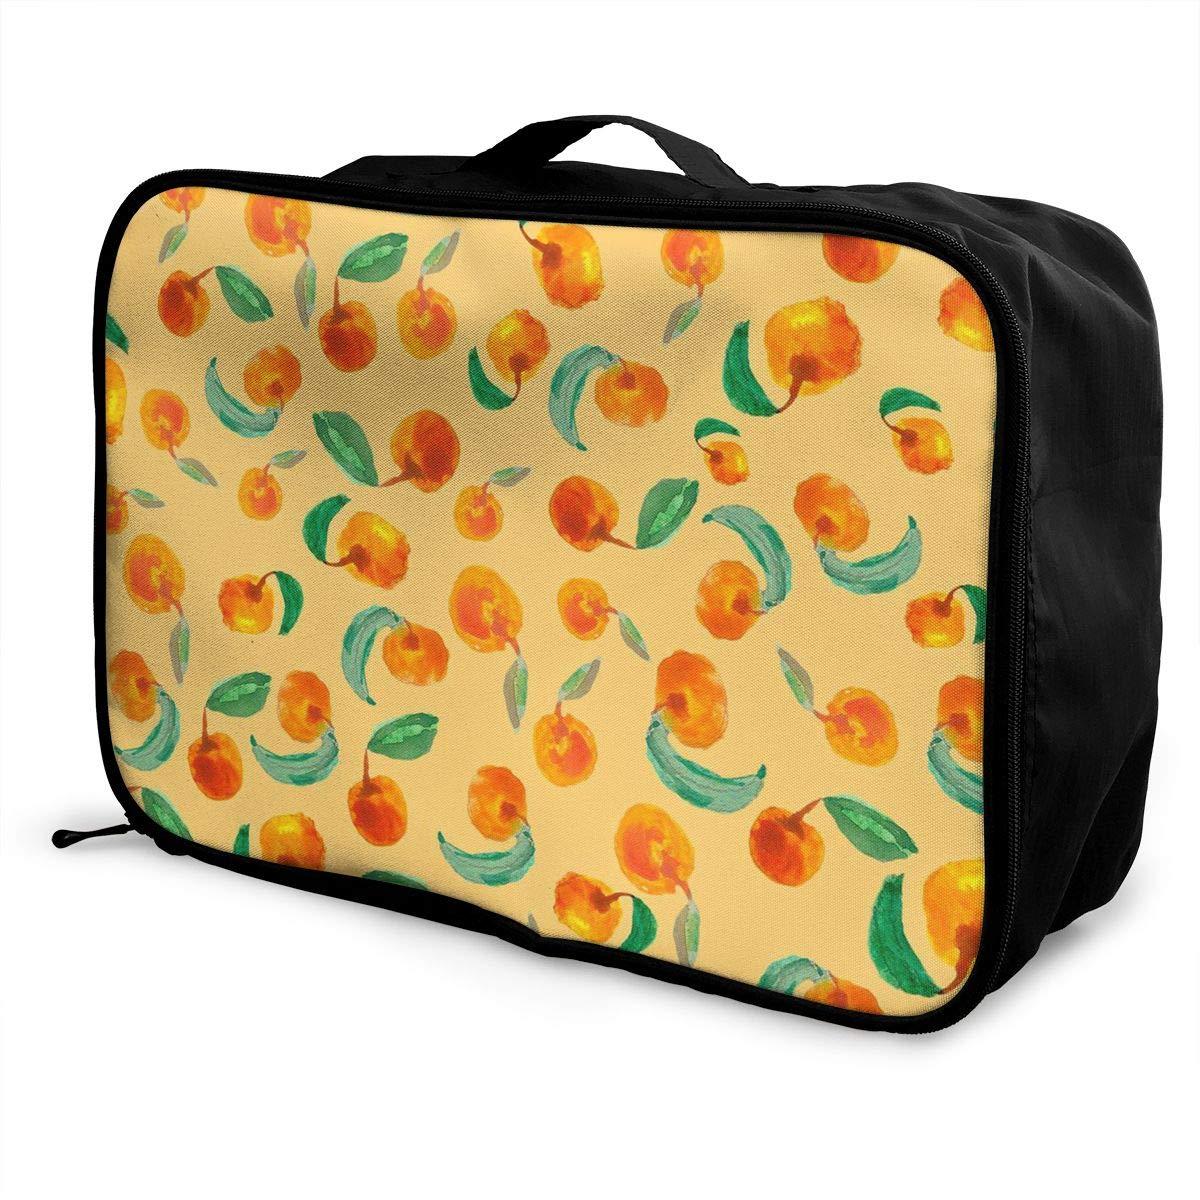 Travel Bags Watercolor Strawberry Pattern Portable Handbag Trolley Handle Luggage Bag